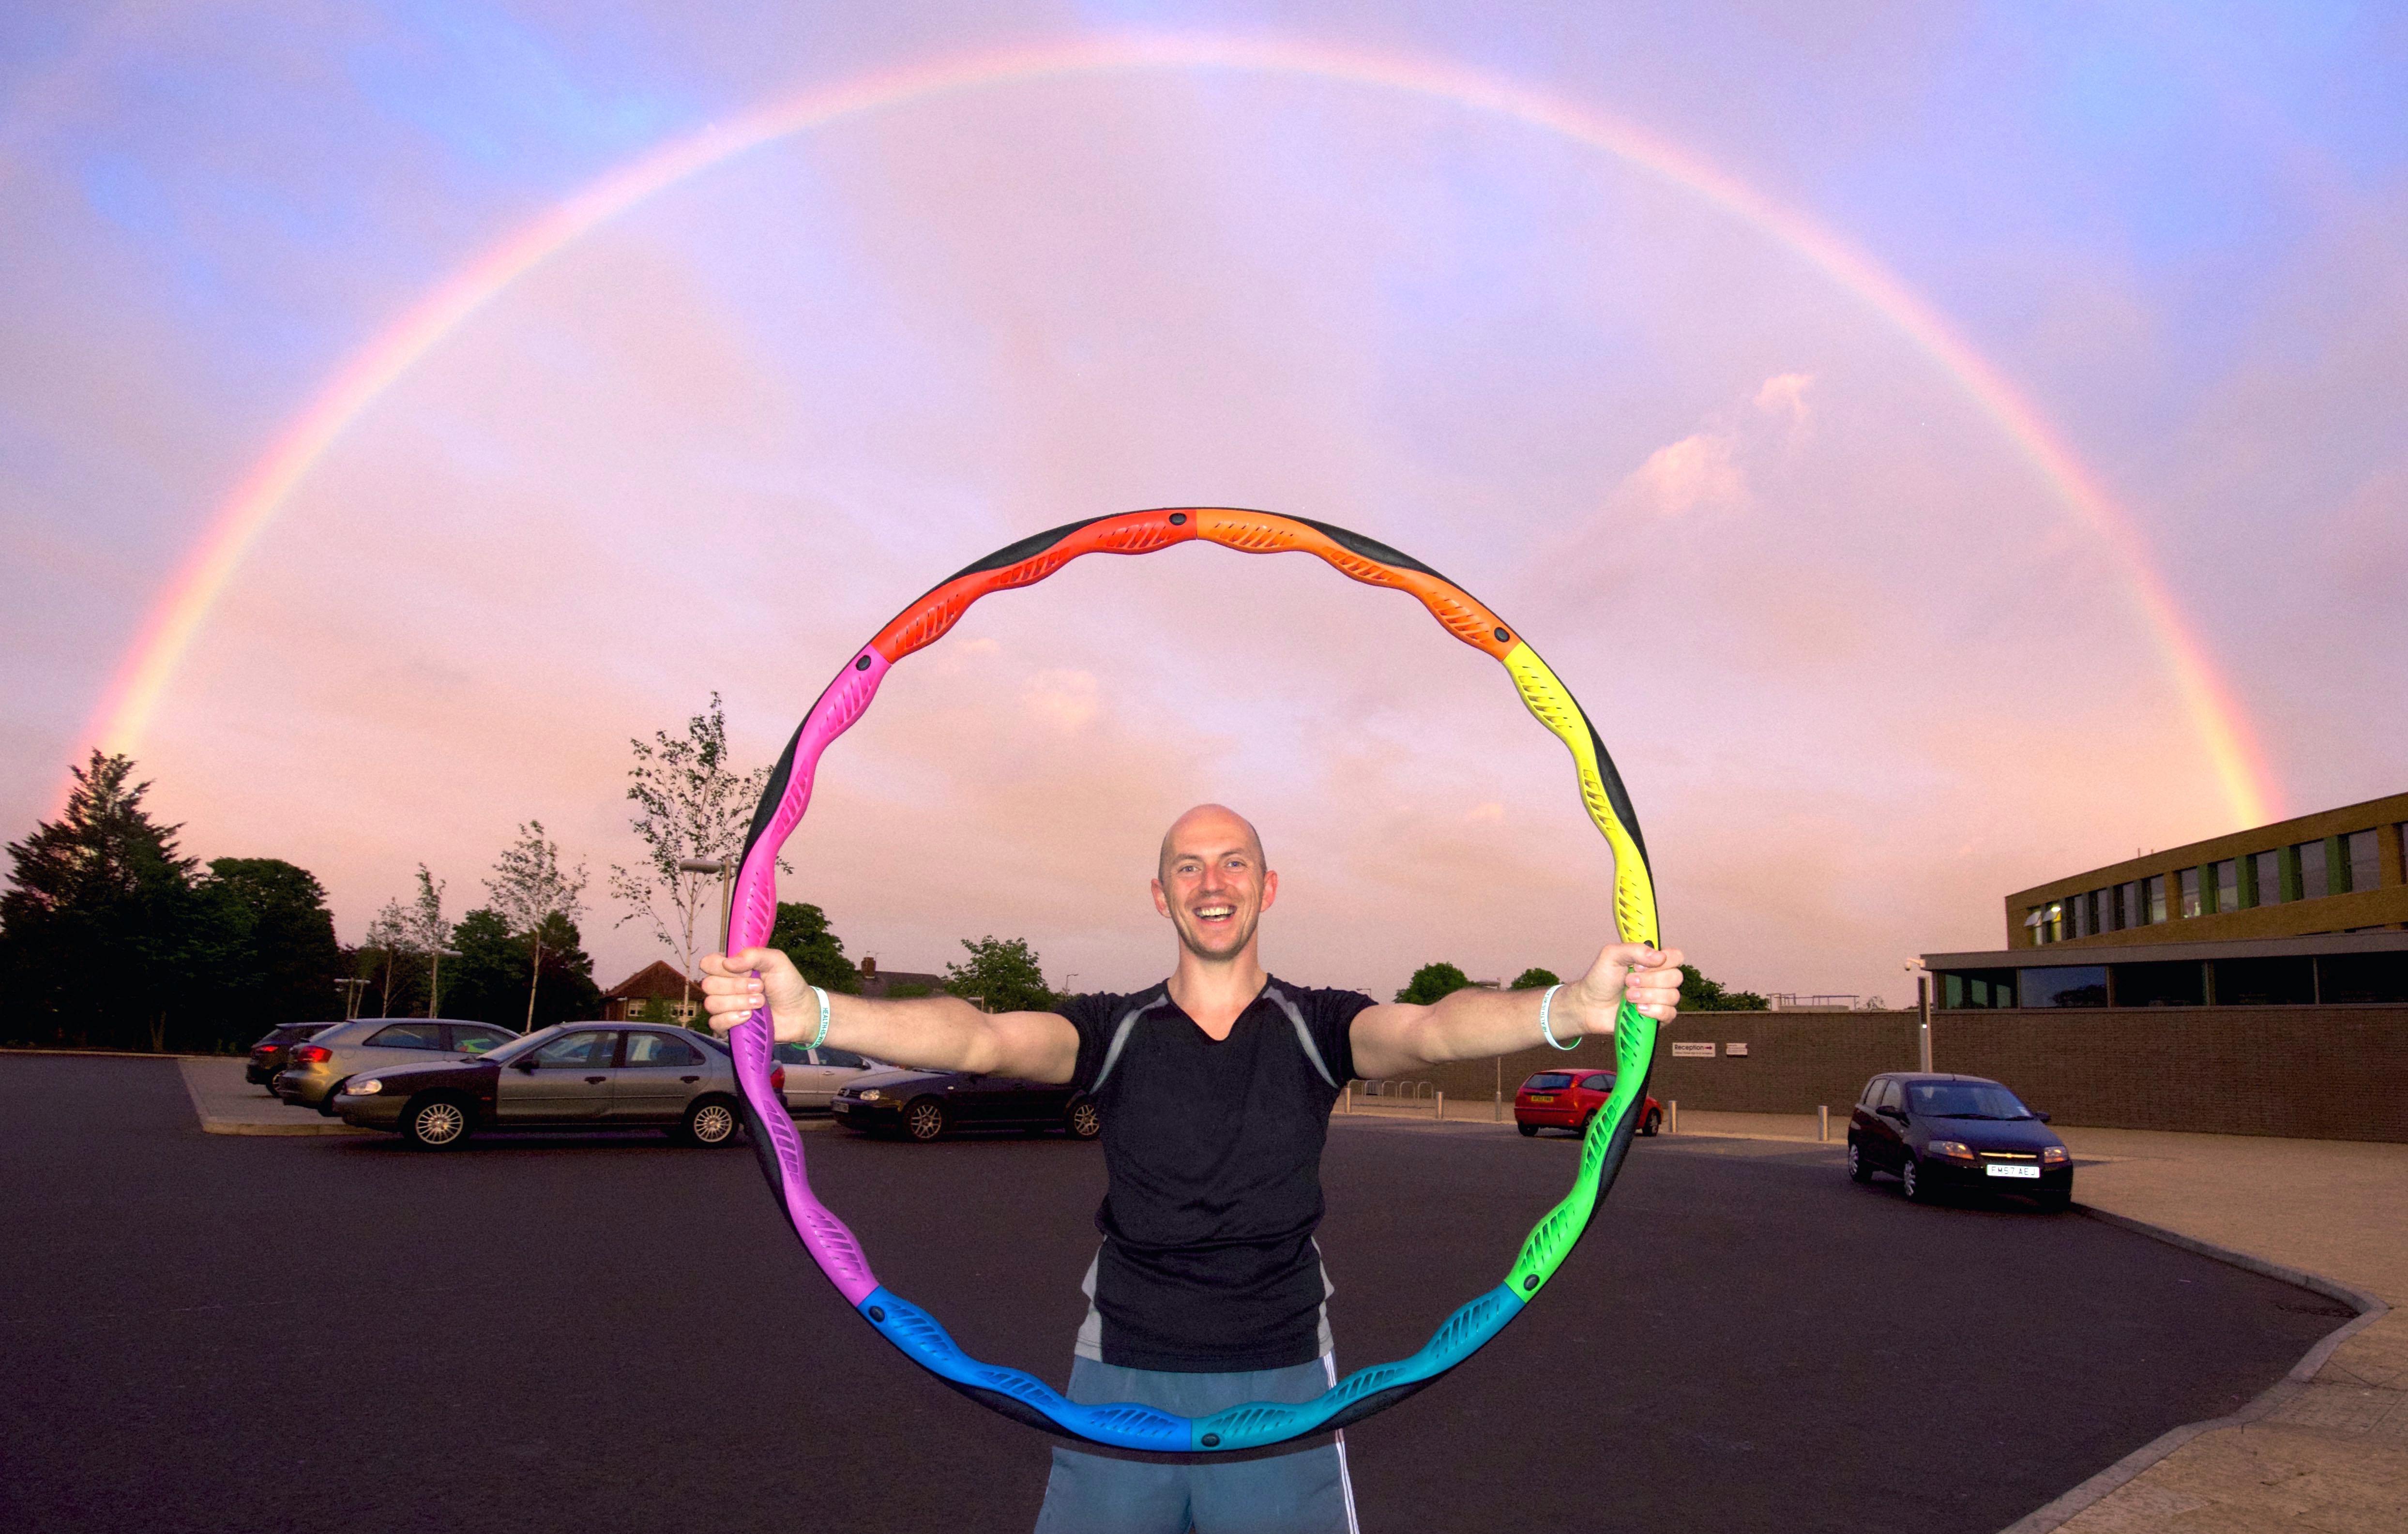 Mr dod with a Powerhoop and rainbow